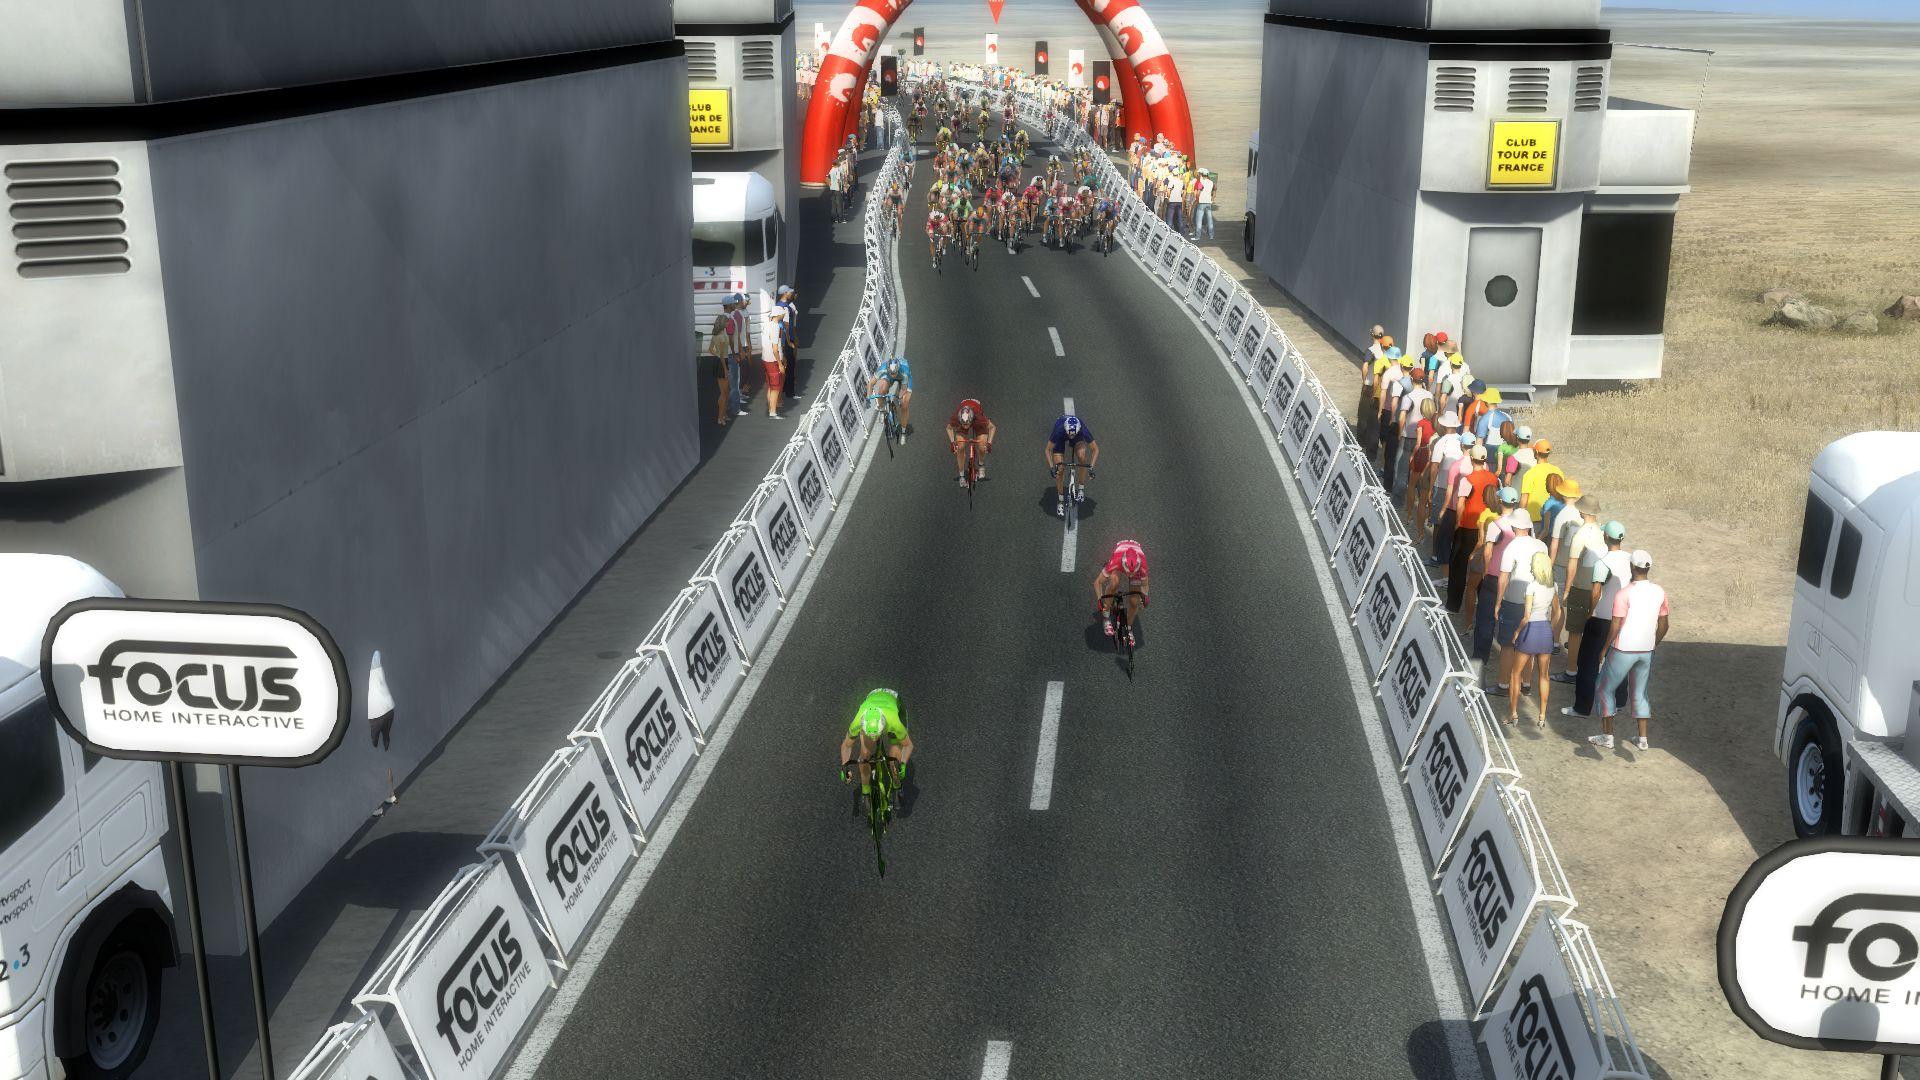 pcmdaily.com/images/mg/2019/Races/PT/Qatar/mg19_qat_s01_15.jpg